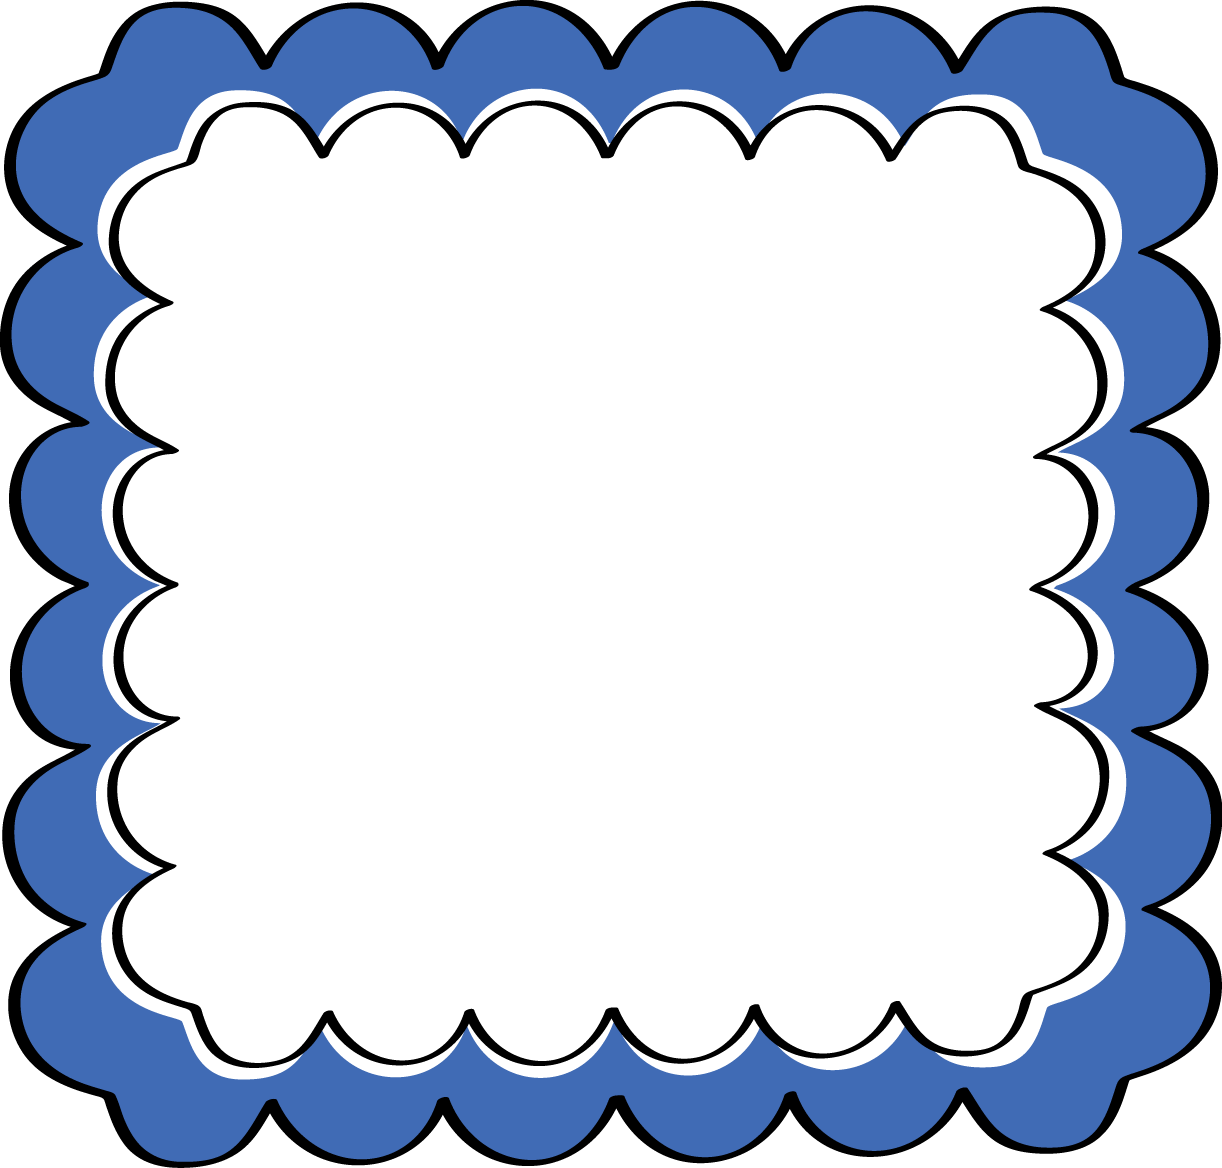 Simple stripe blue border clipart svg library library Free Stripe Frame Cliparts, Download Free Clip Art, Free ... svg library library